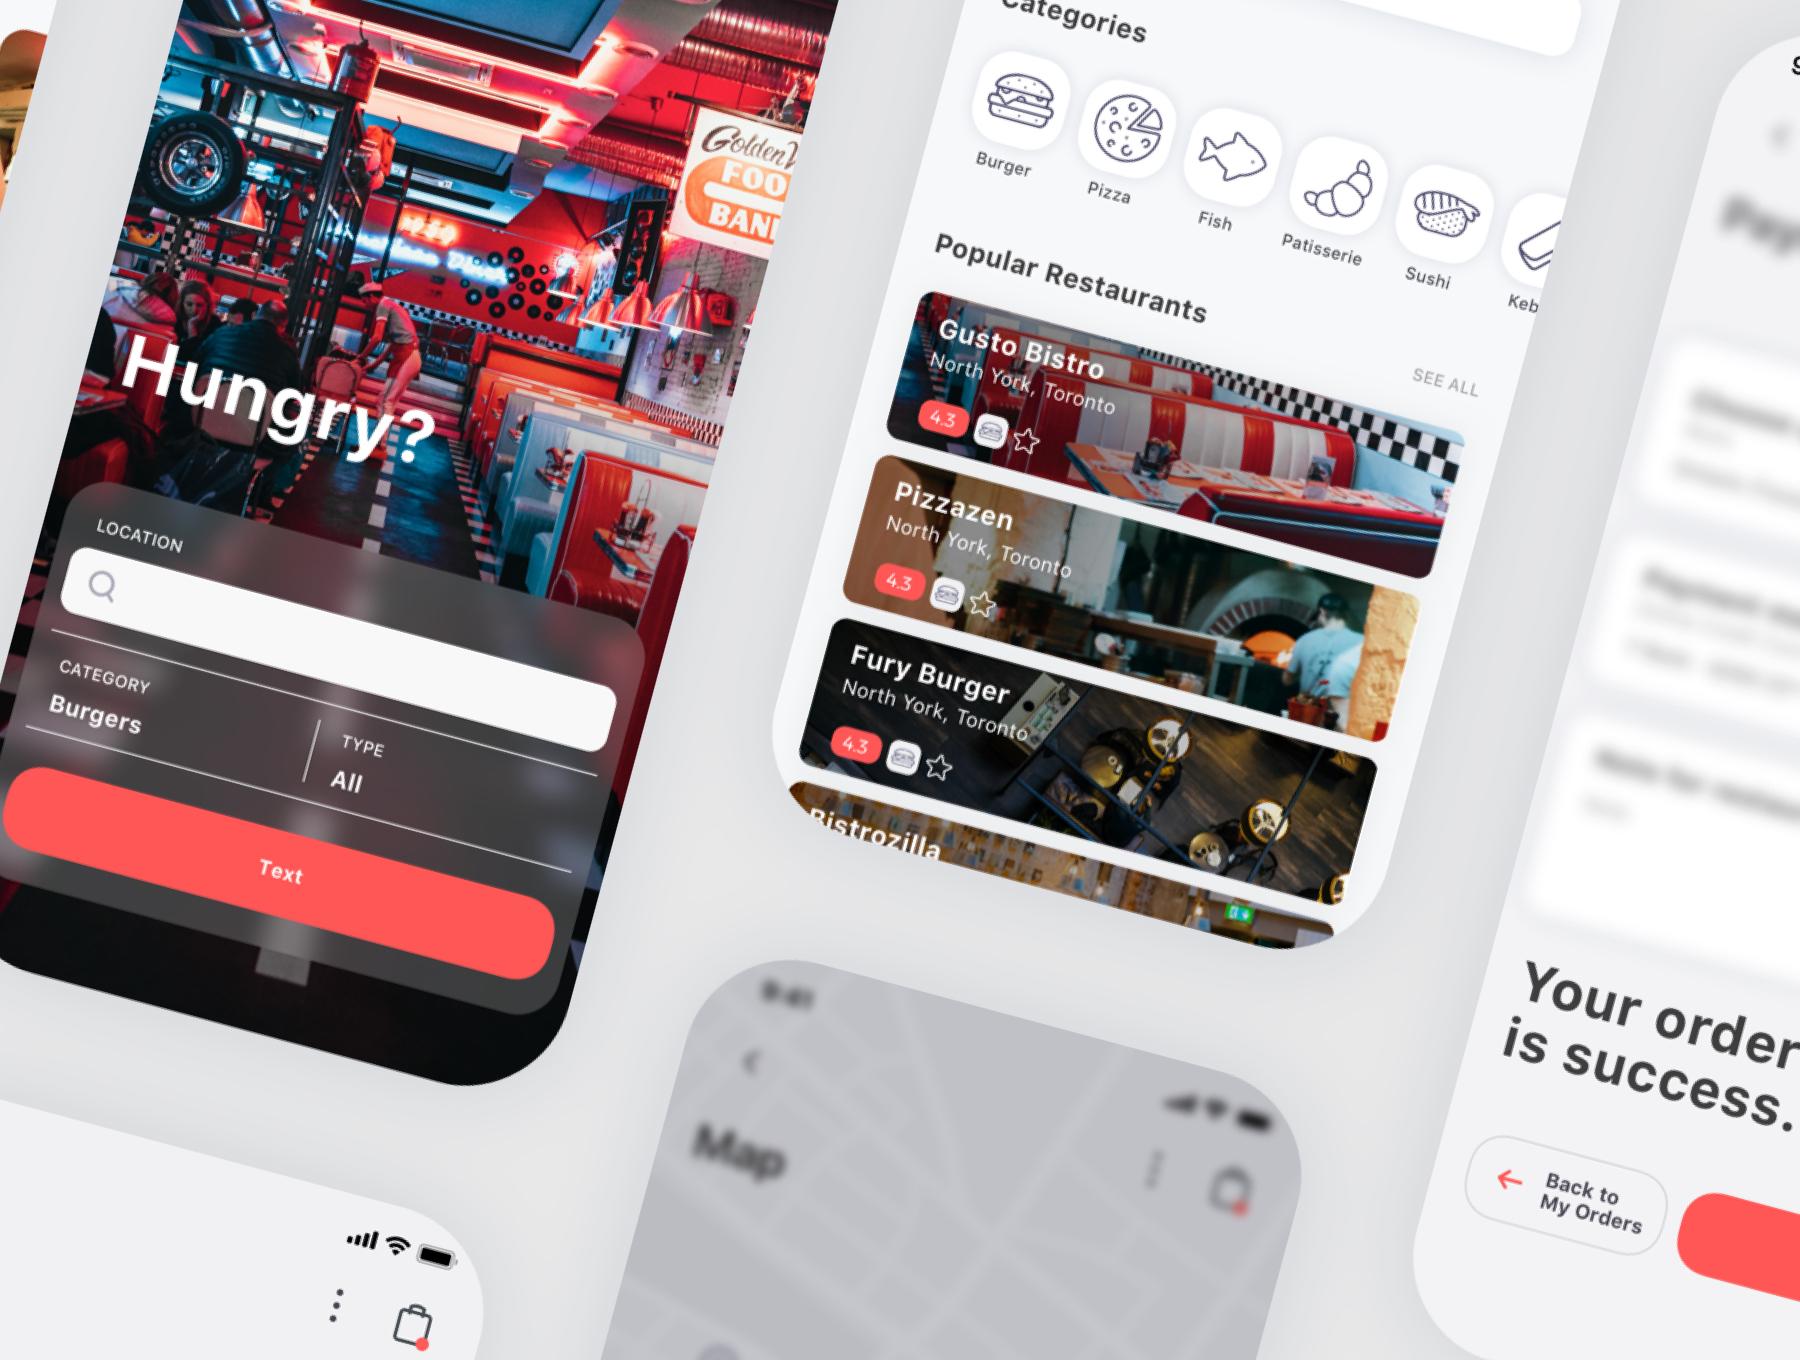 食物外卖配送应用APP设计UI套件 Spes Food Delivery App UI Kit插图(9)